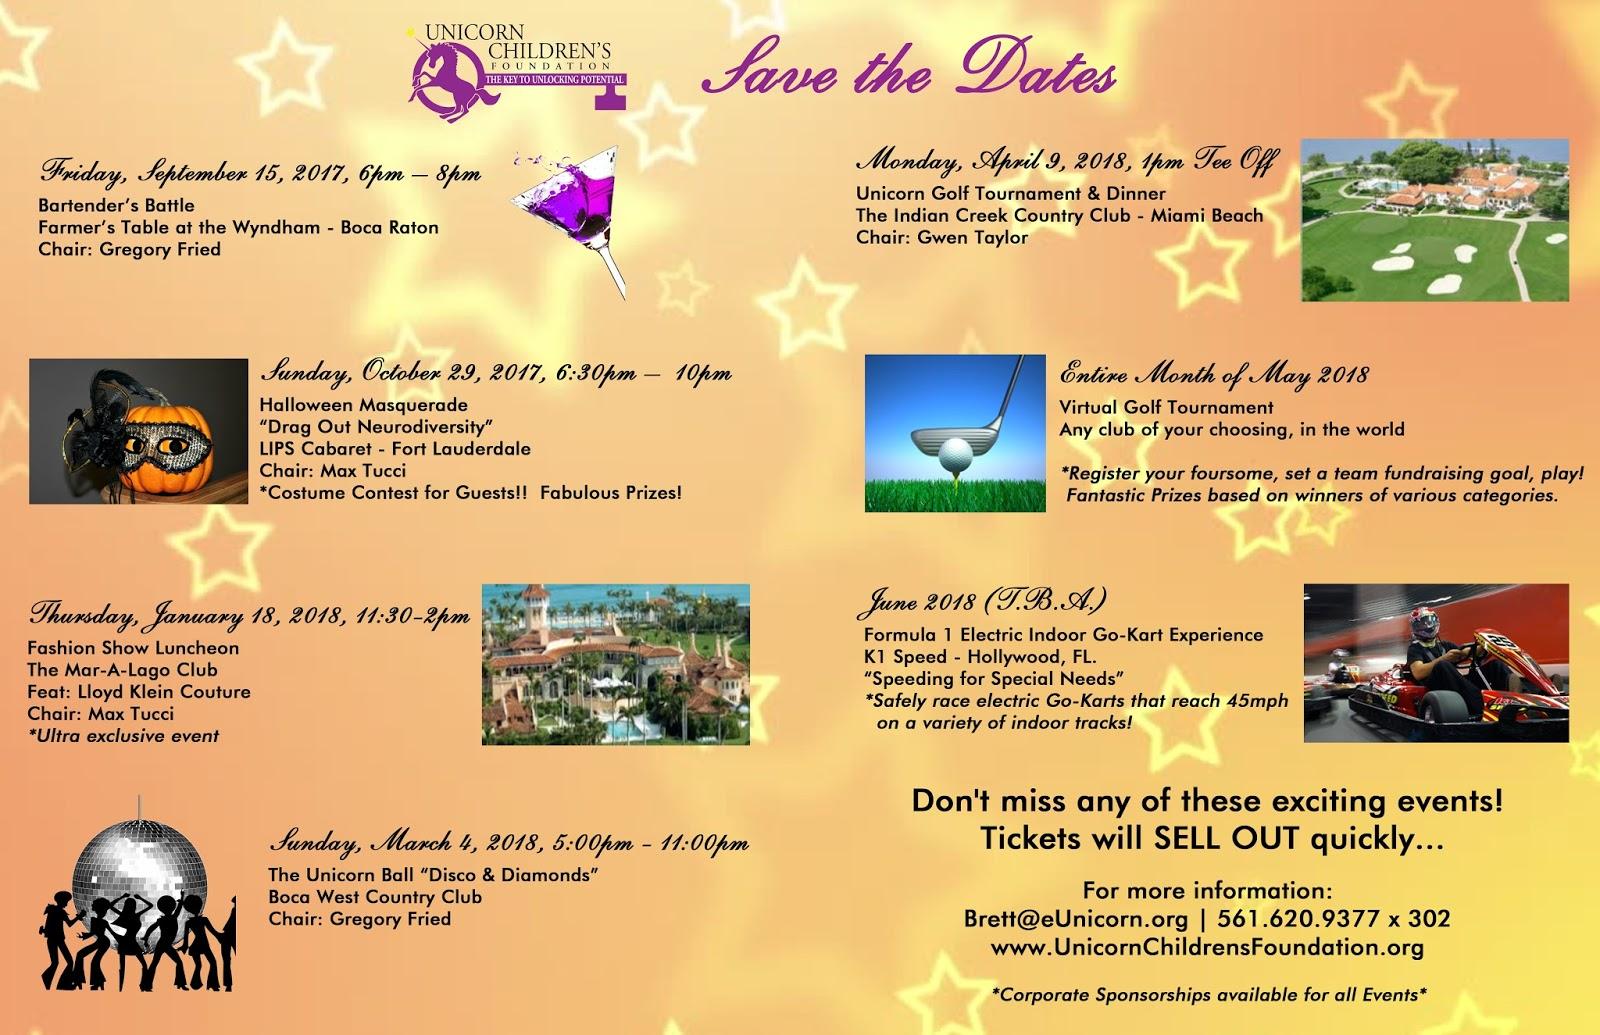 Unicorn Children's Foundation: Mark your calendars!!